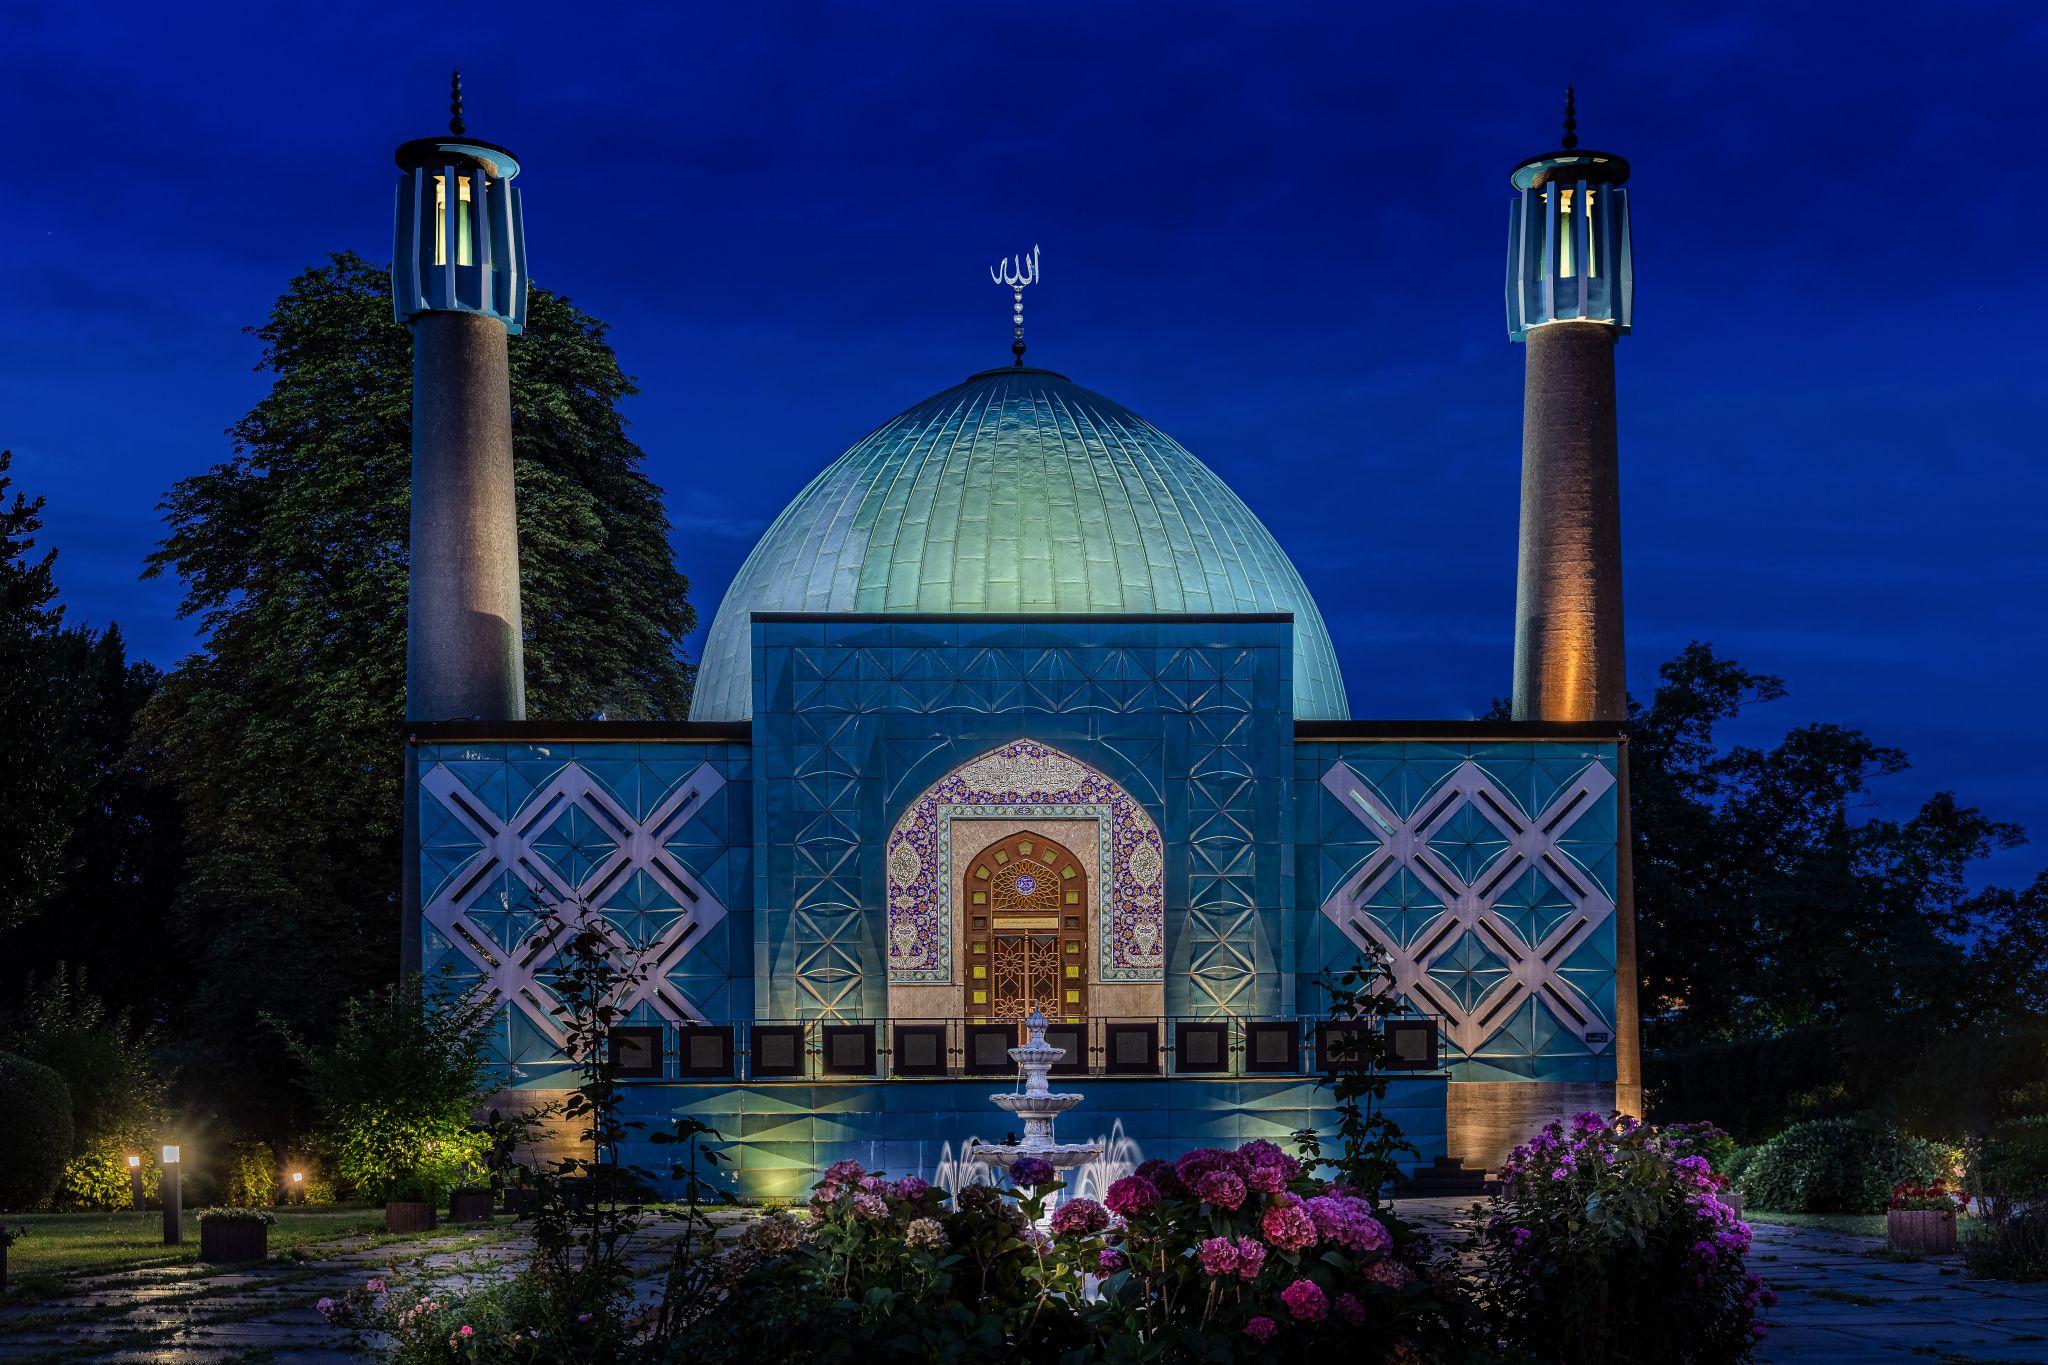 Blaue Moschee, Germany